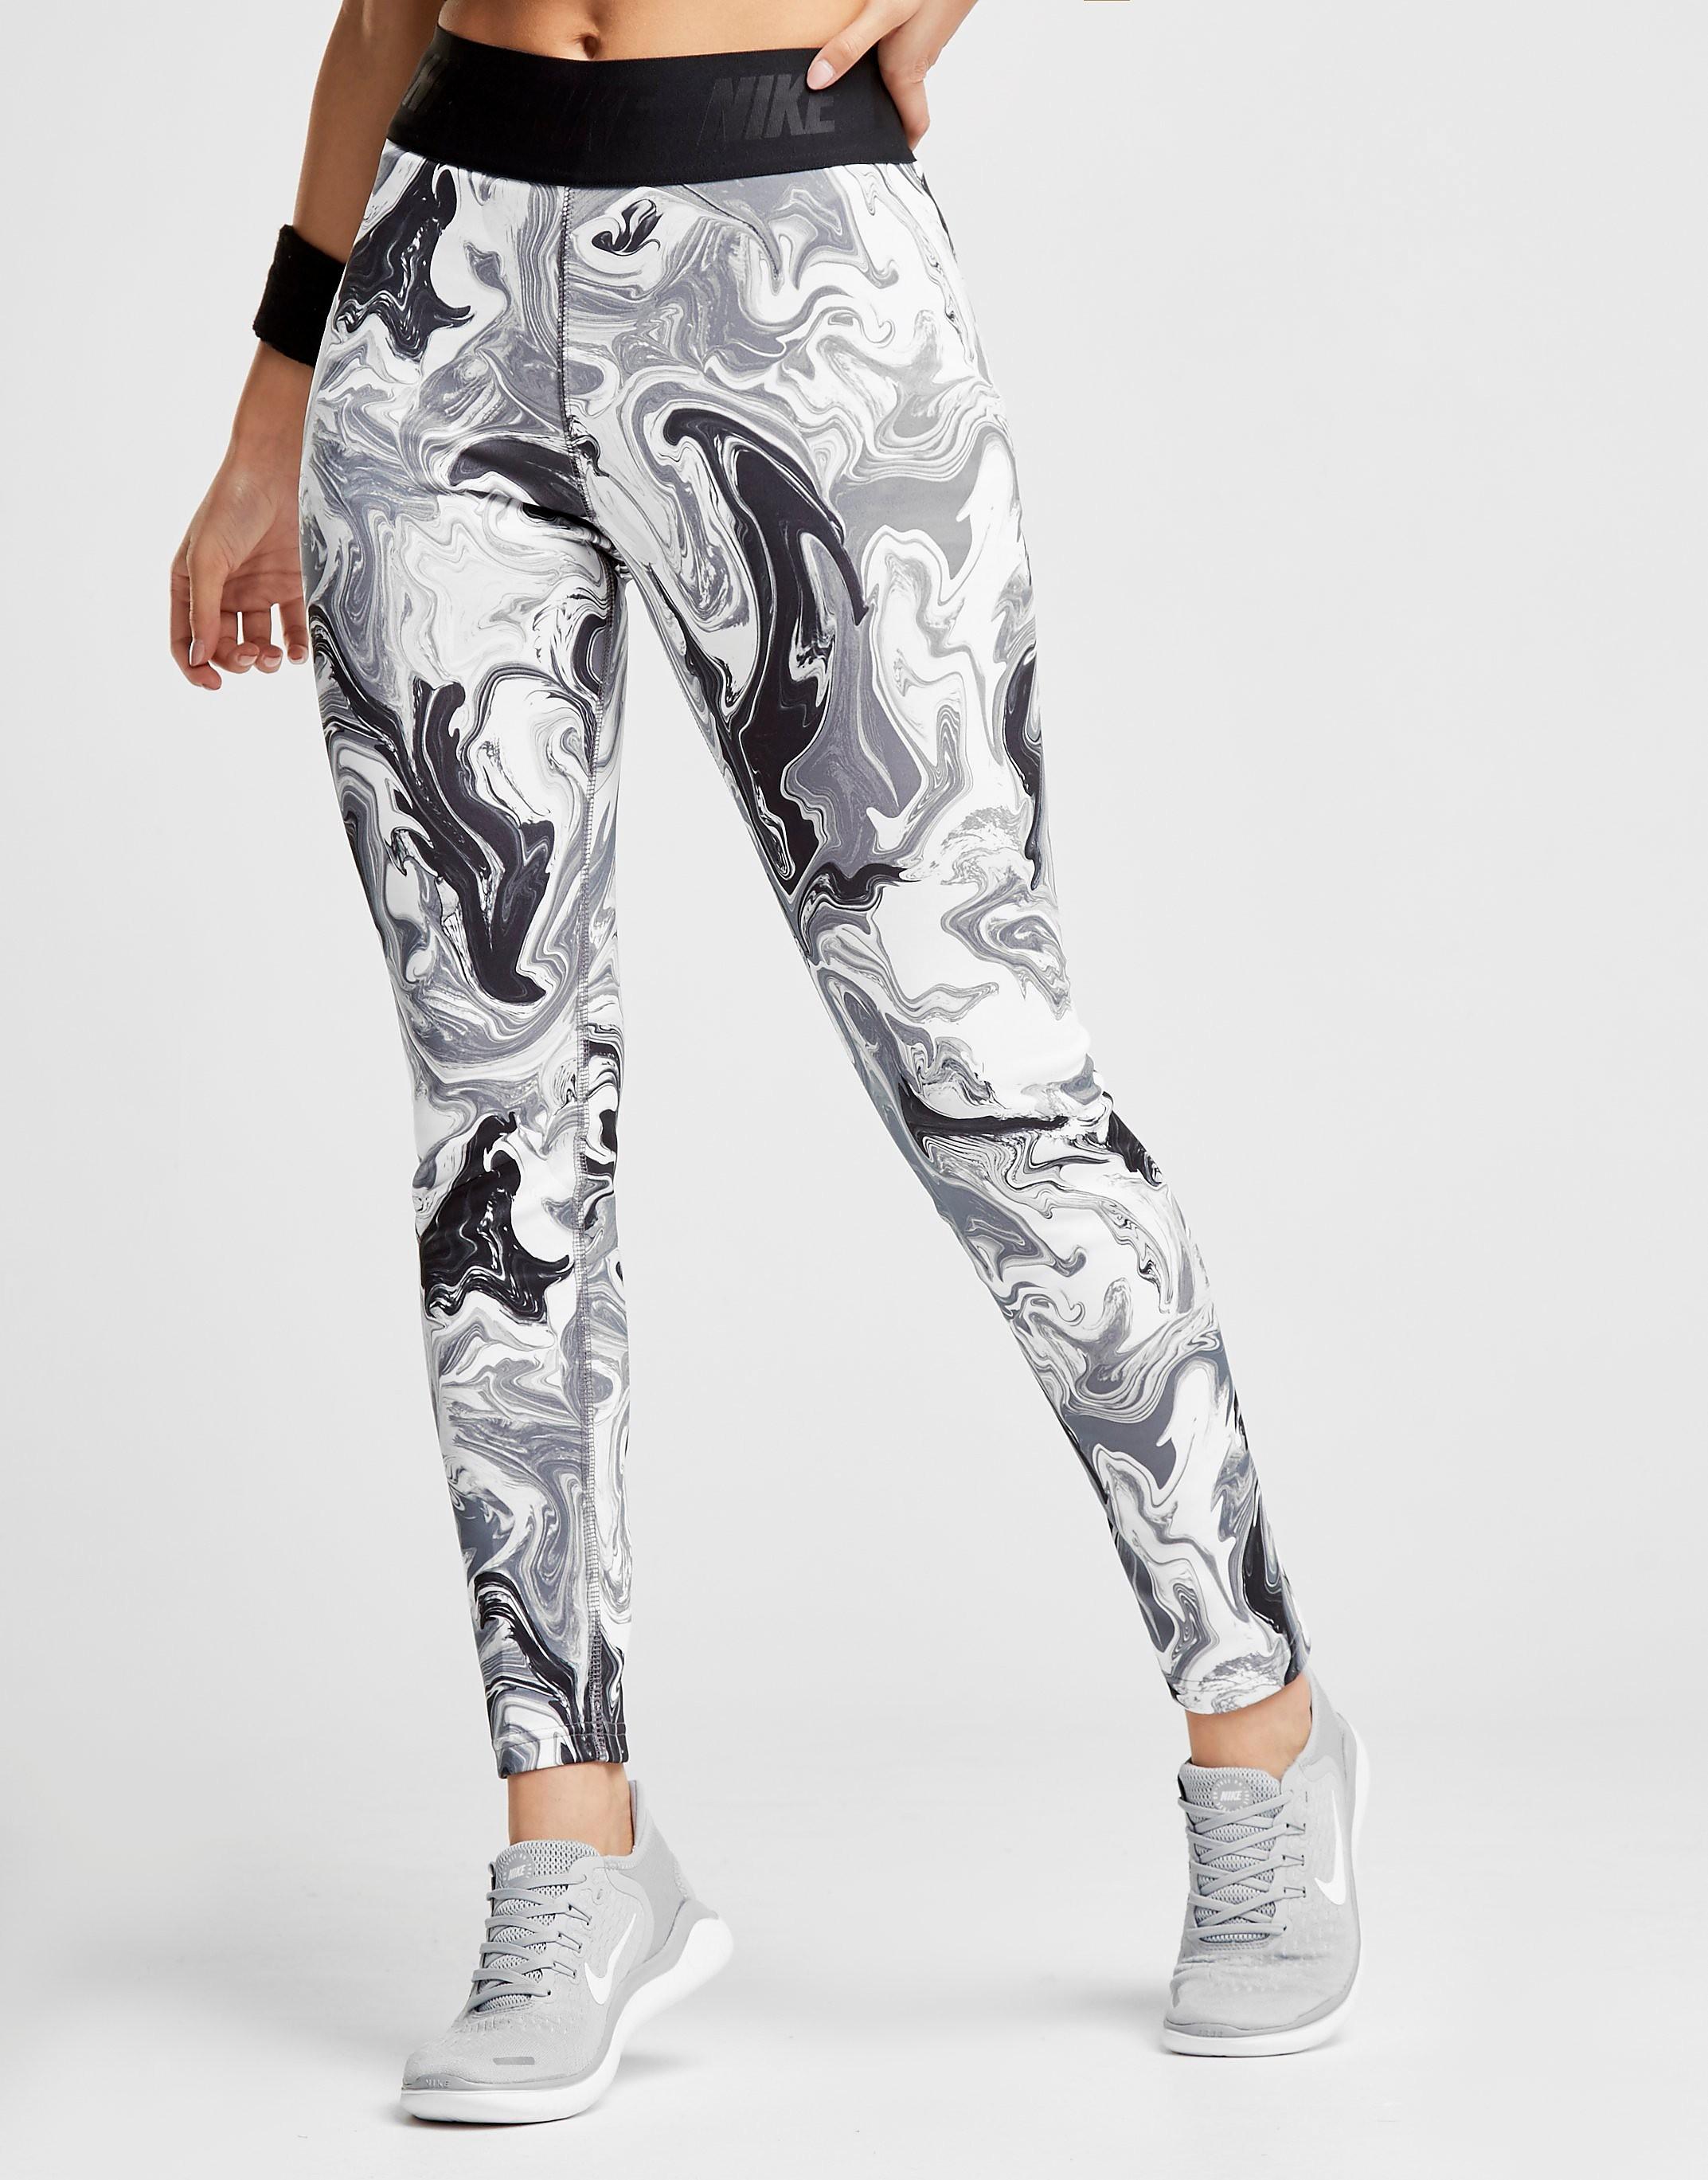 Nike Leggings Marble Print Femme